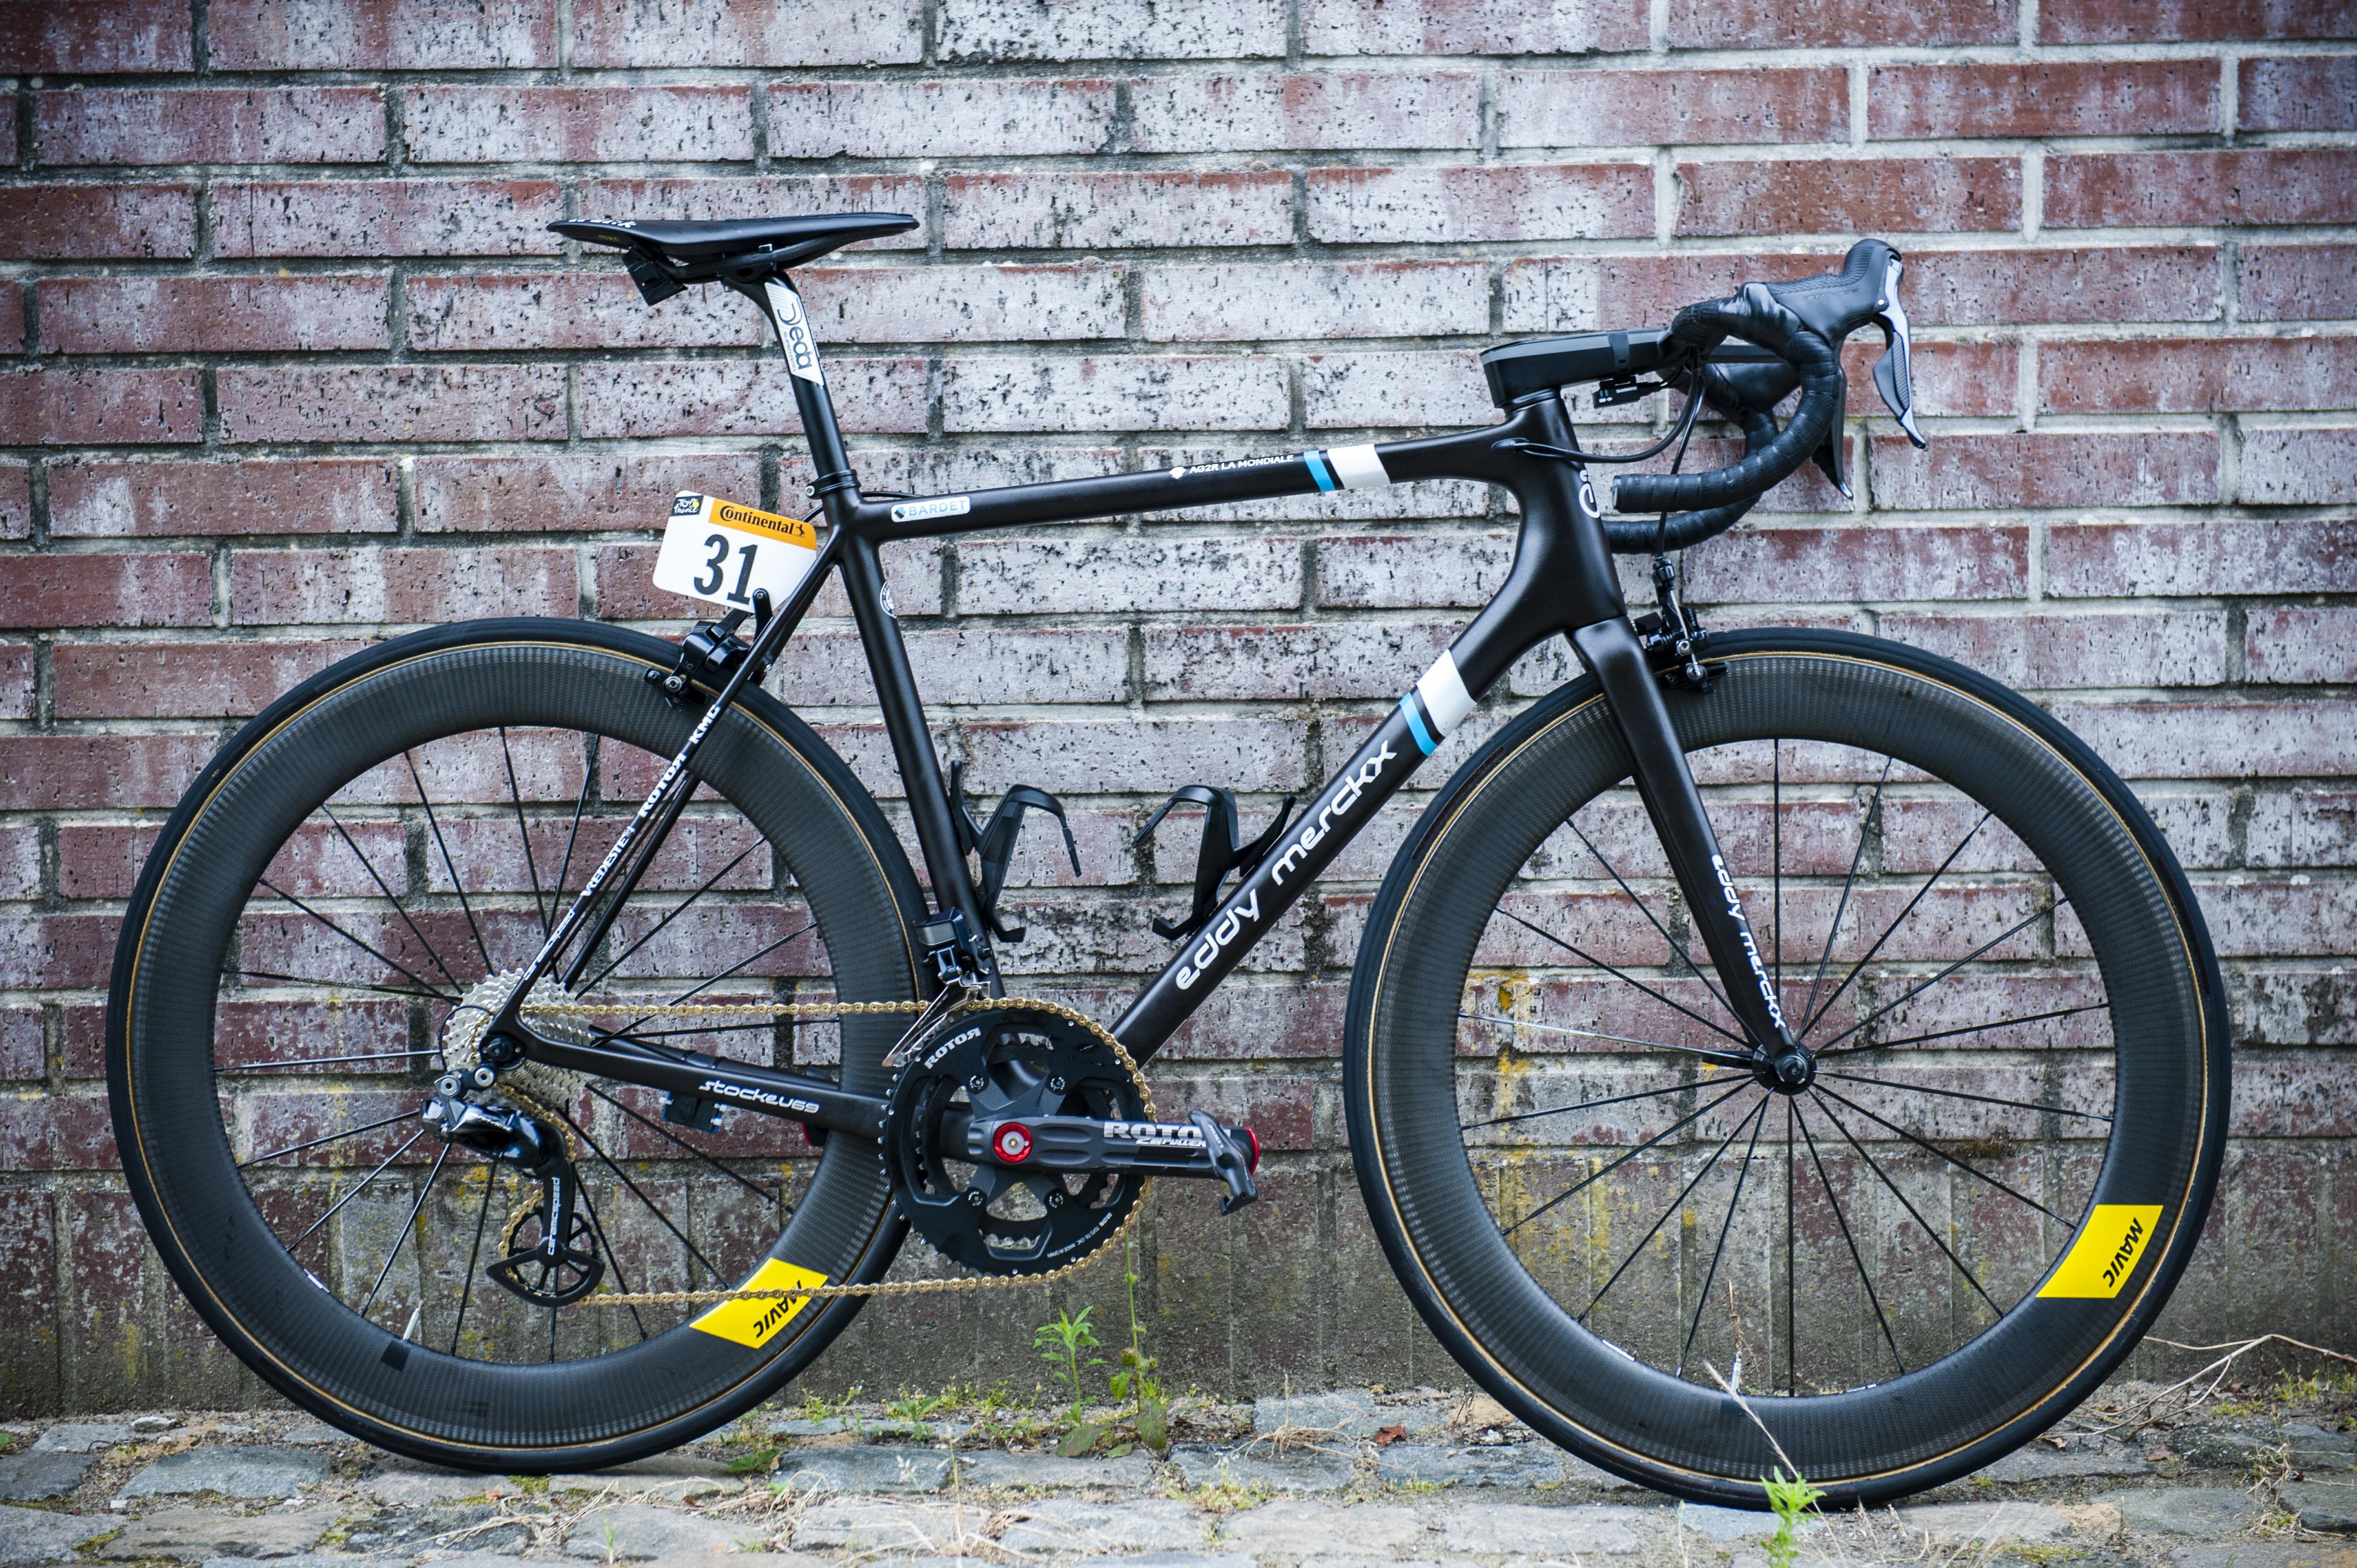 https://www.cyclist.co.uk/news/6694/romain-bardets-eddy-merckx-bike-for-the-2019-tour-de-france#0